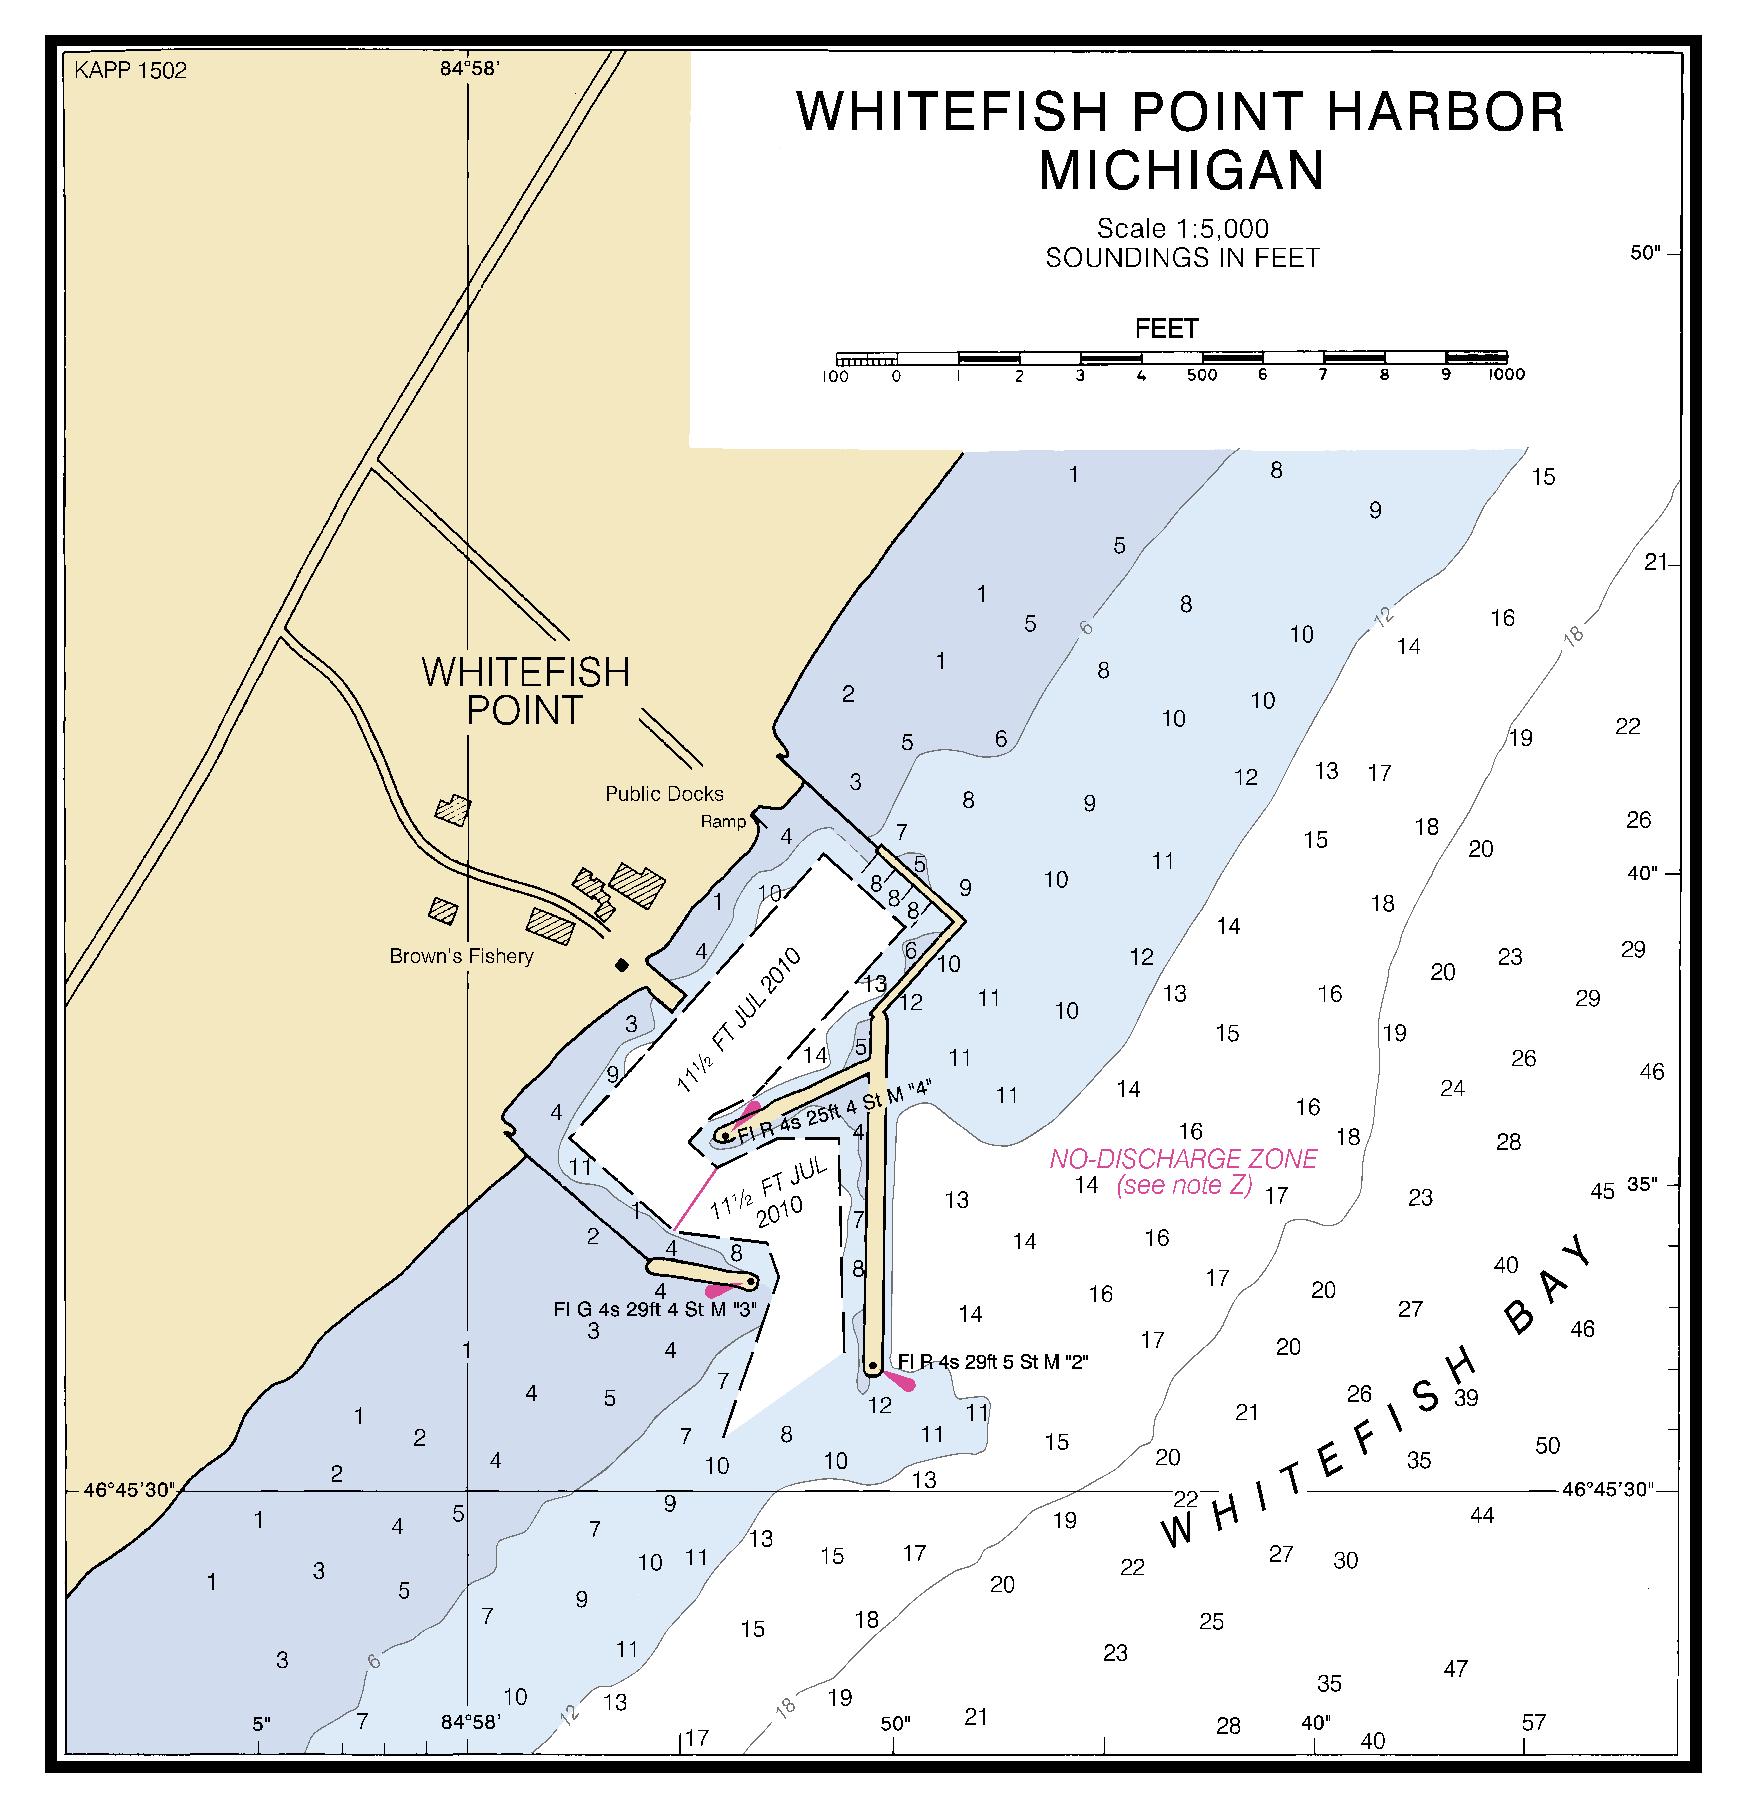 Whitefish point harbor michigan nautical chart for White fish point